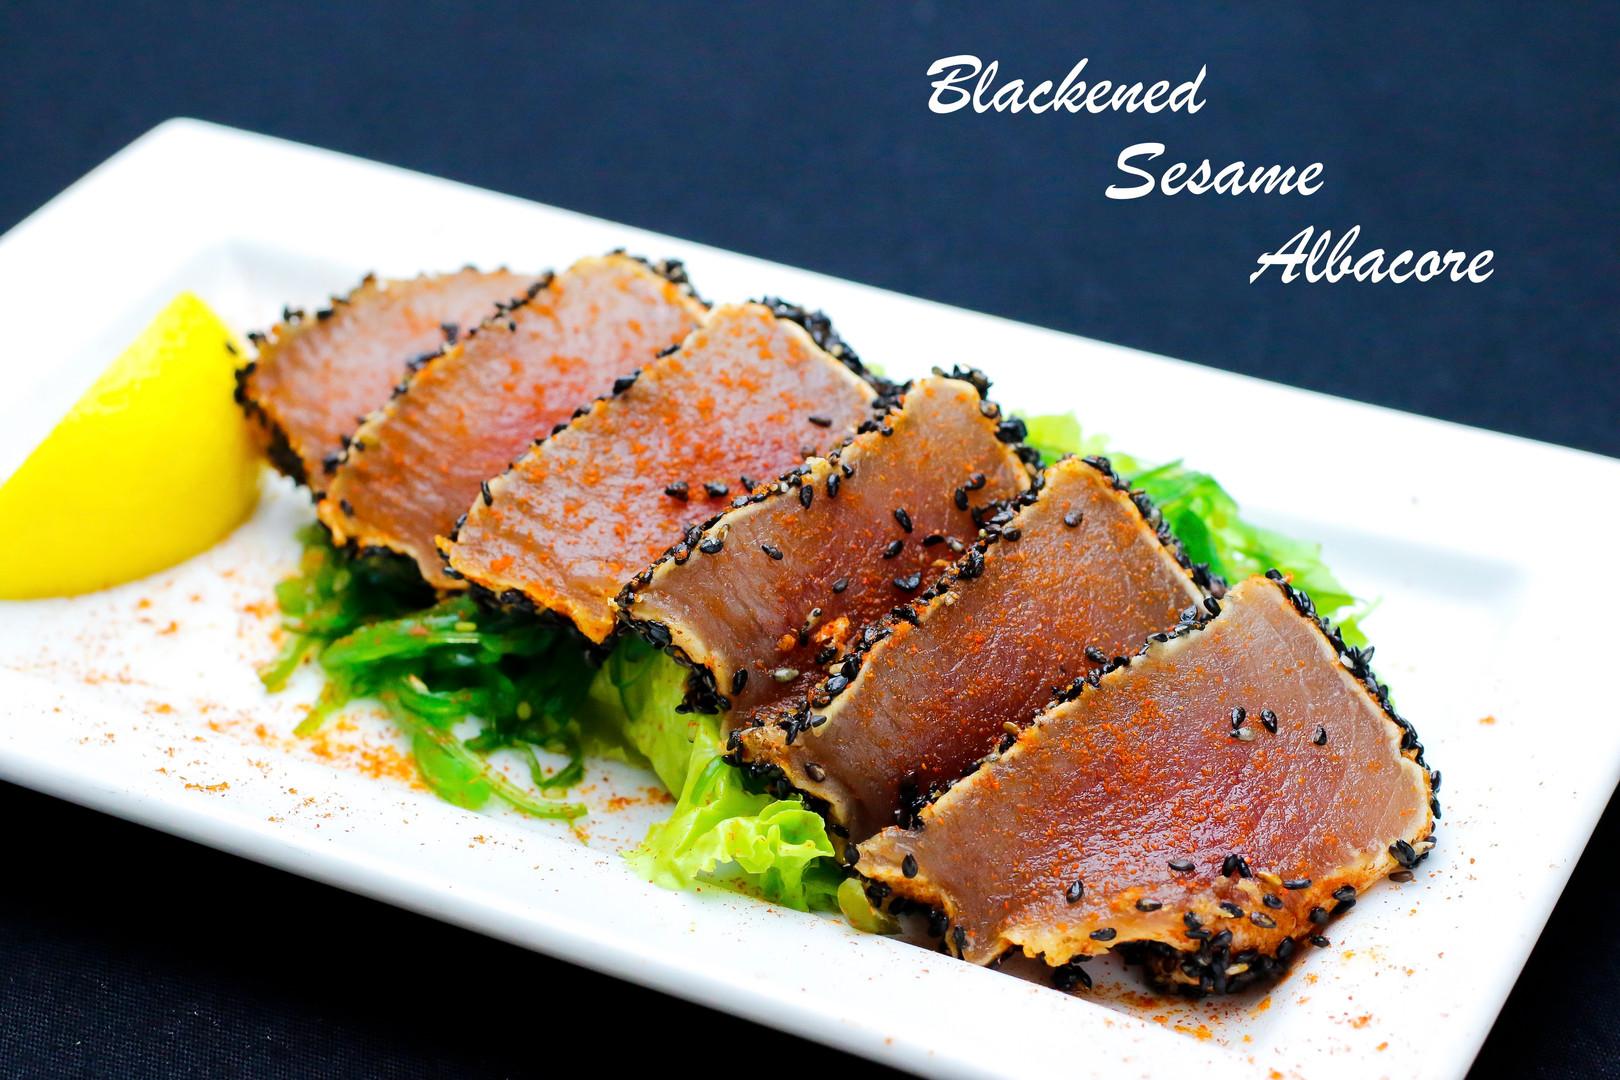 Blackened Sesame Albacore